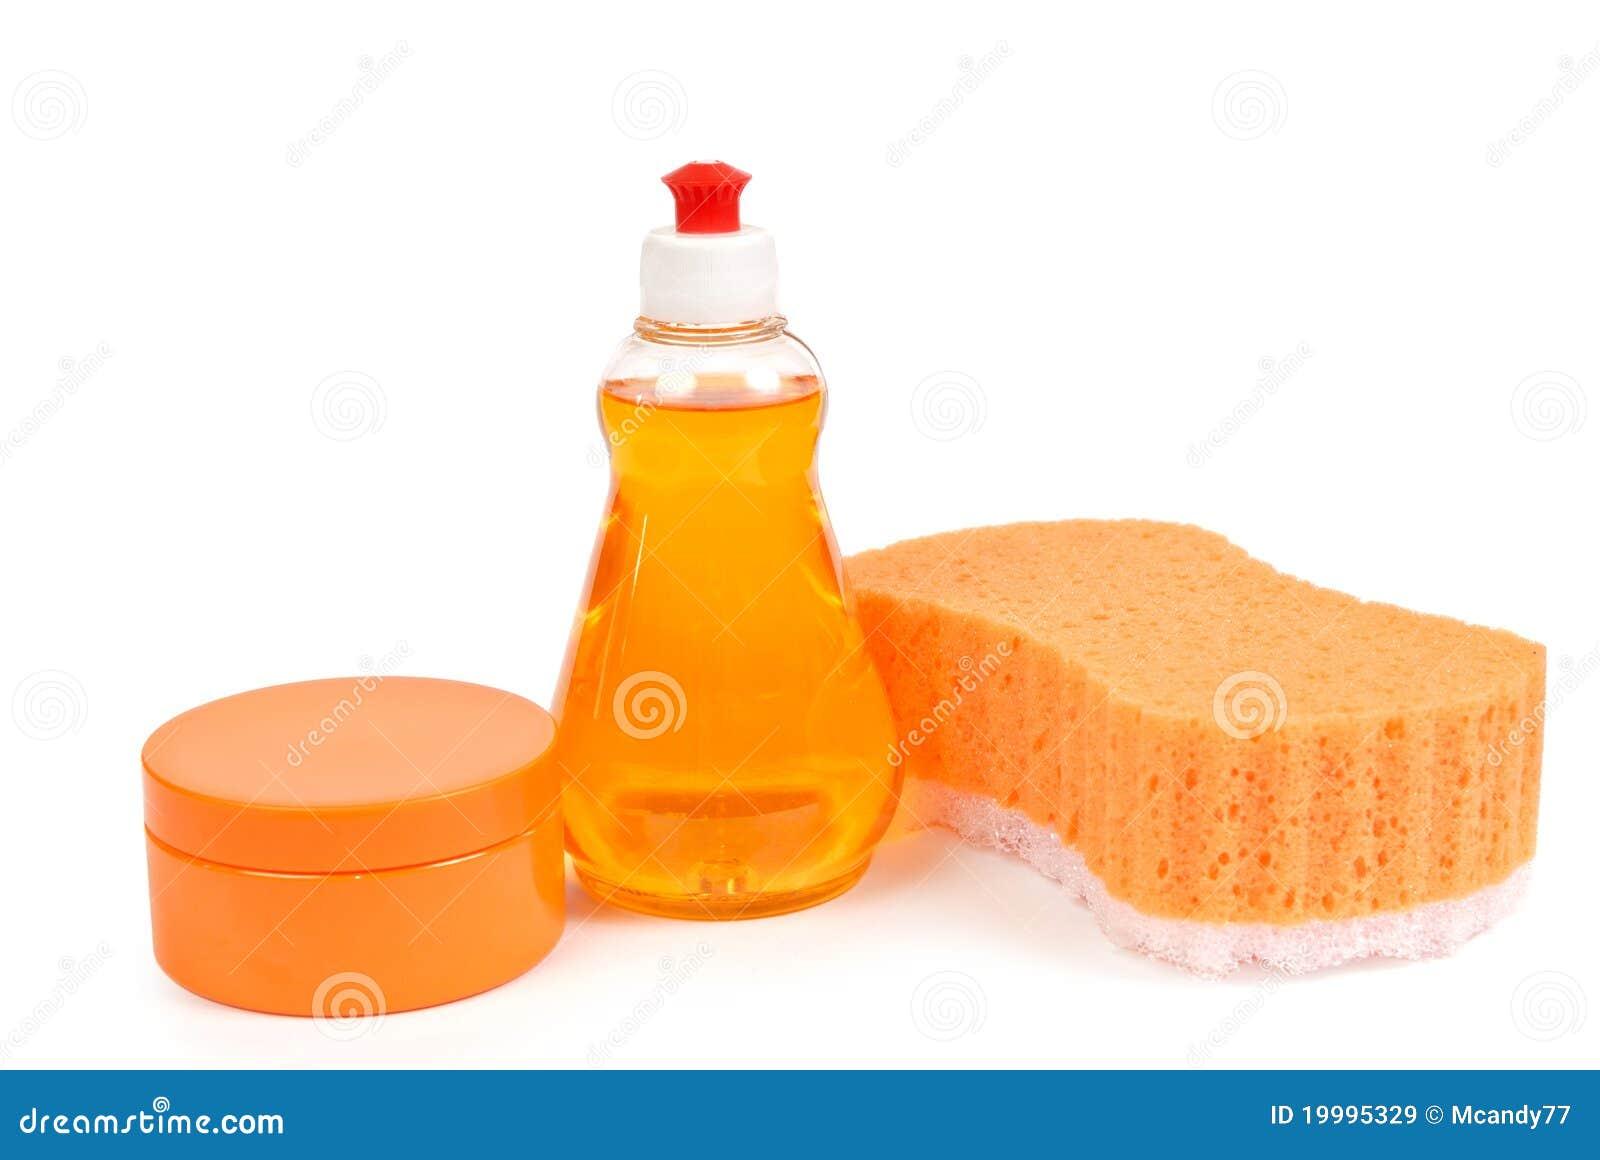 toilet accessories of orange color royalty free stock images image 19995329. Black Bedroom Furniture Sets. Home Design Ideas